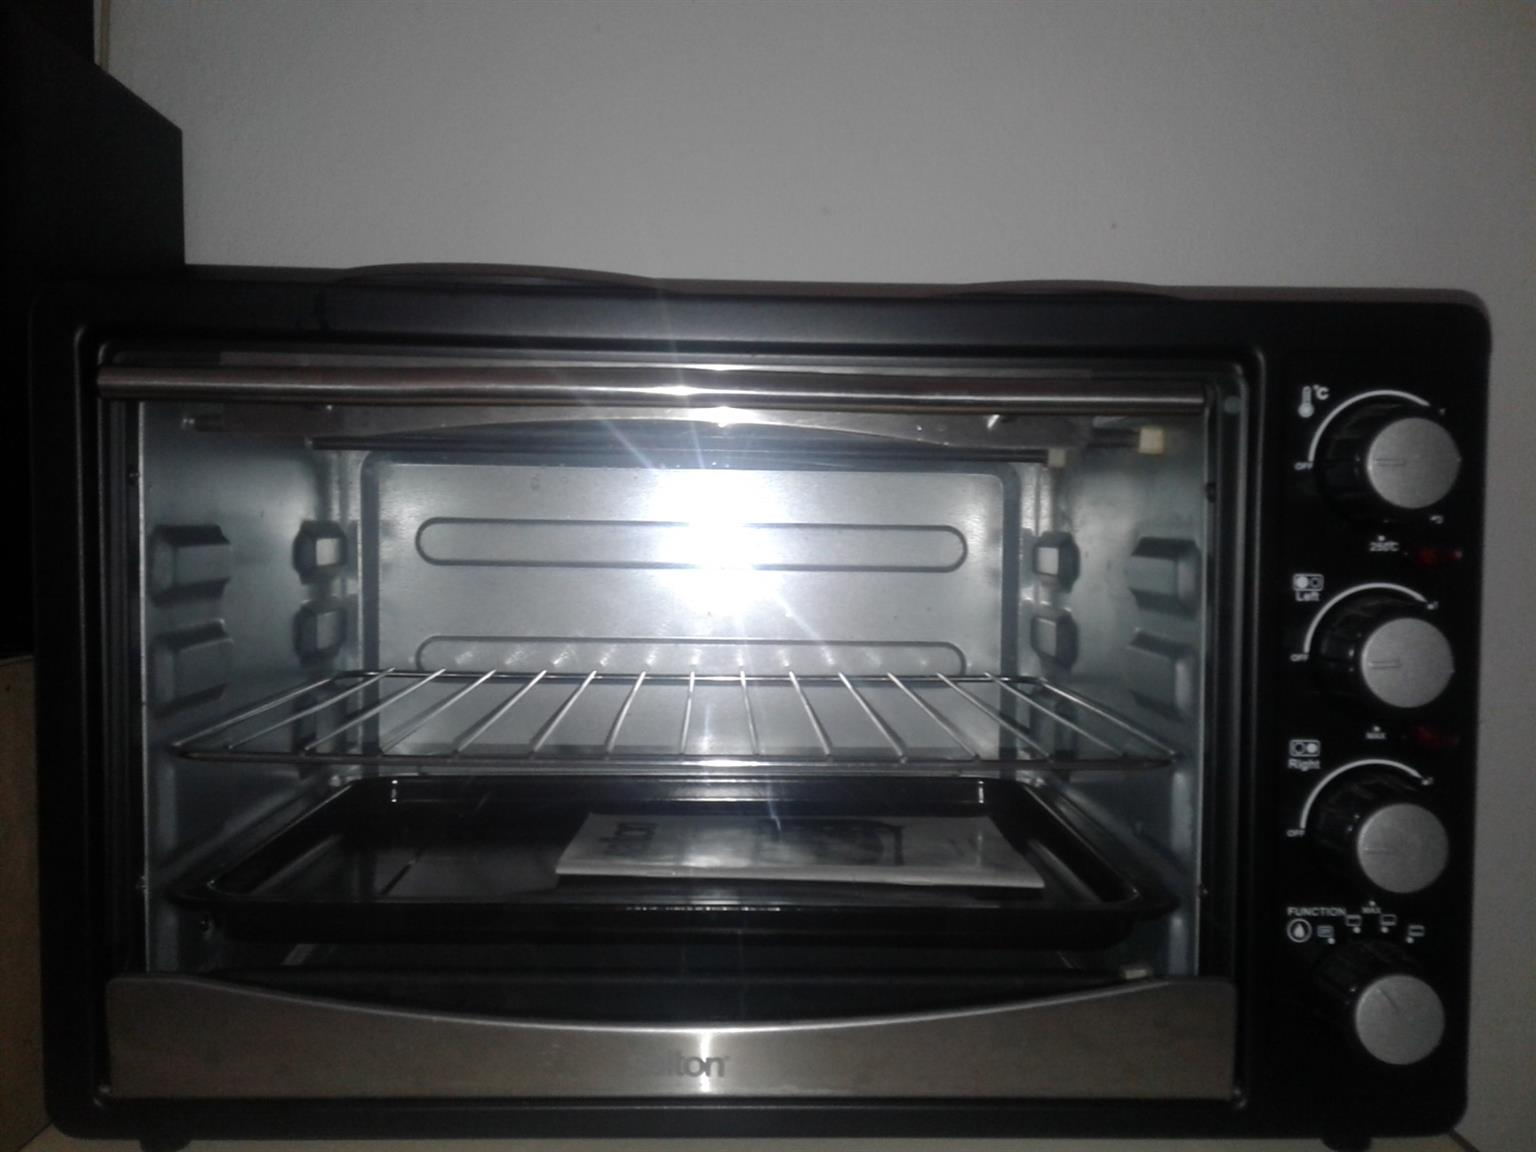 Salton 2 Plate Oven